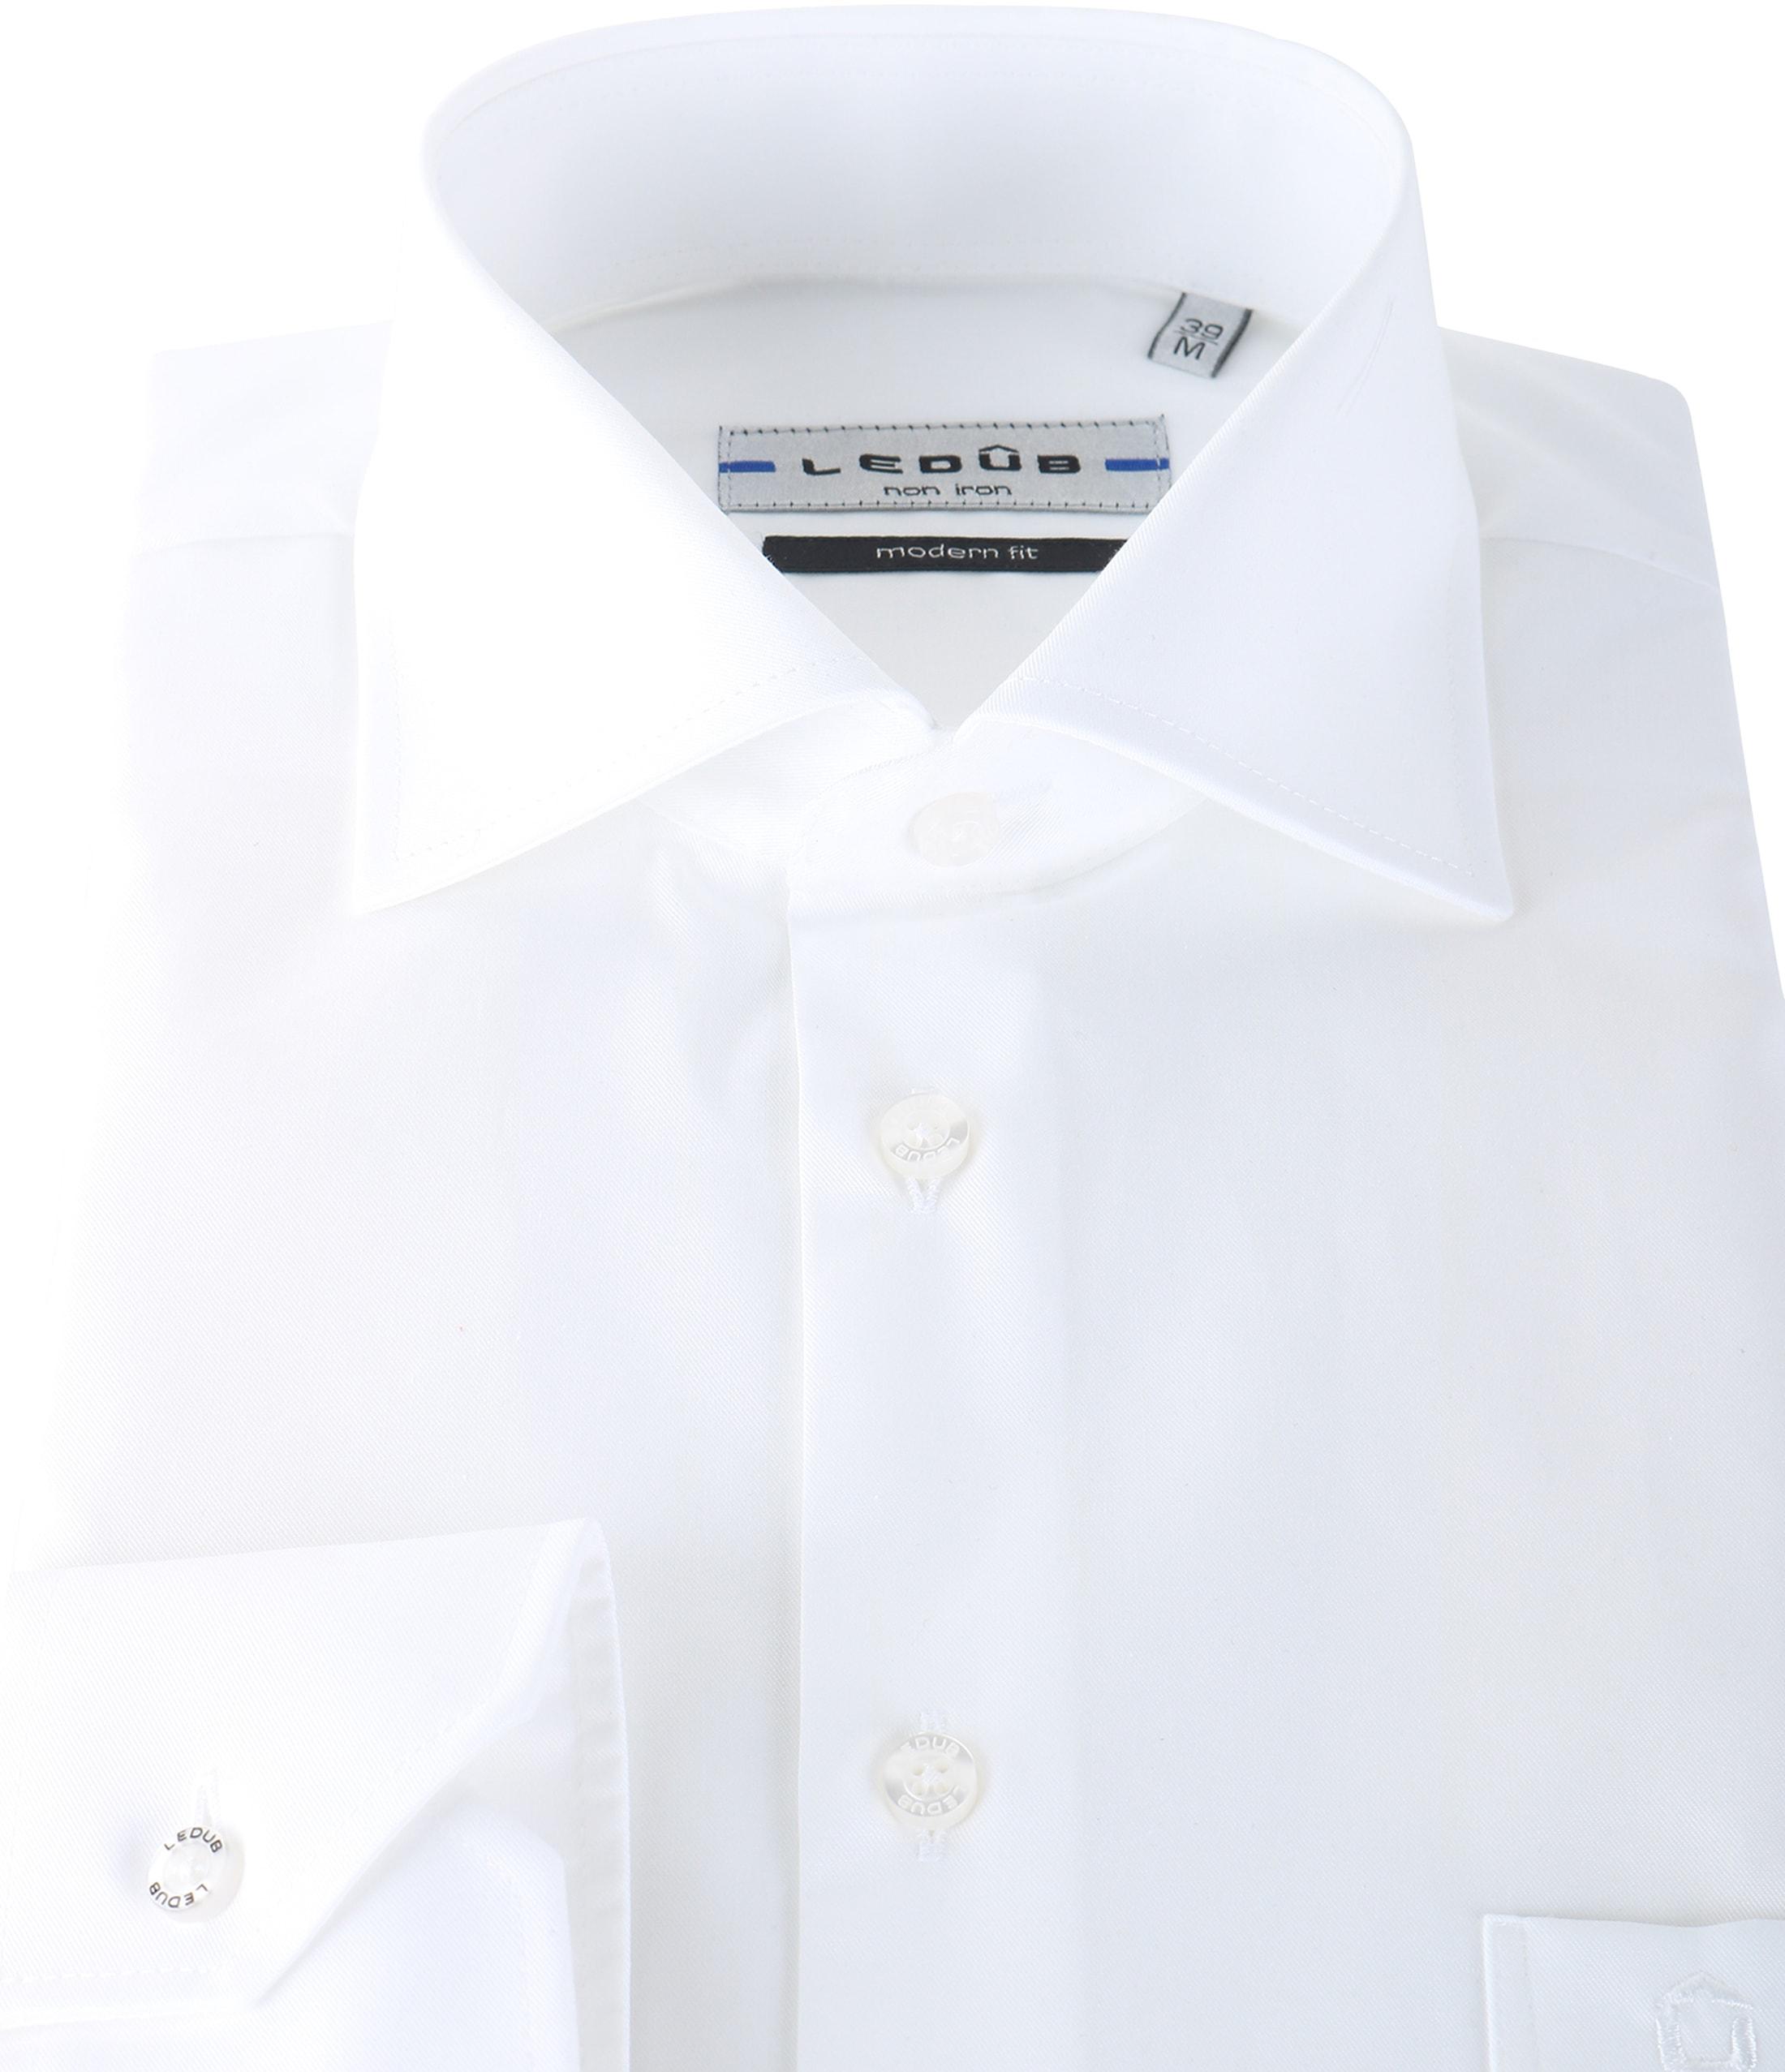 Ledub Overhemd Wit  Non Iron foto 2